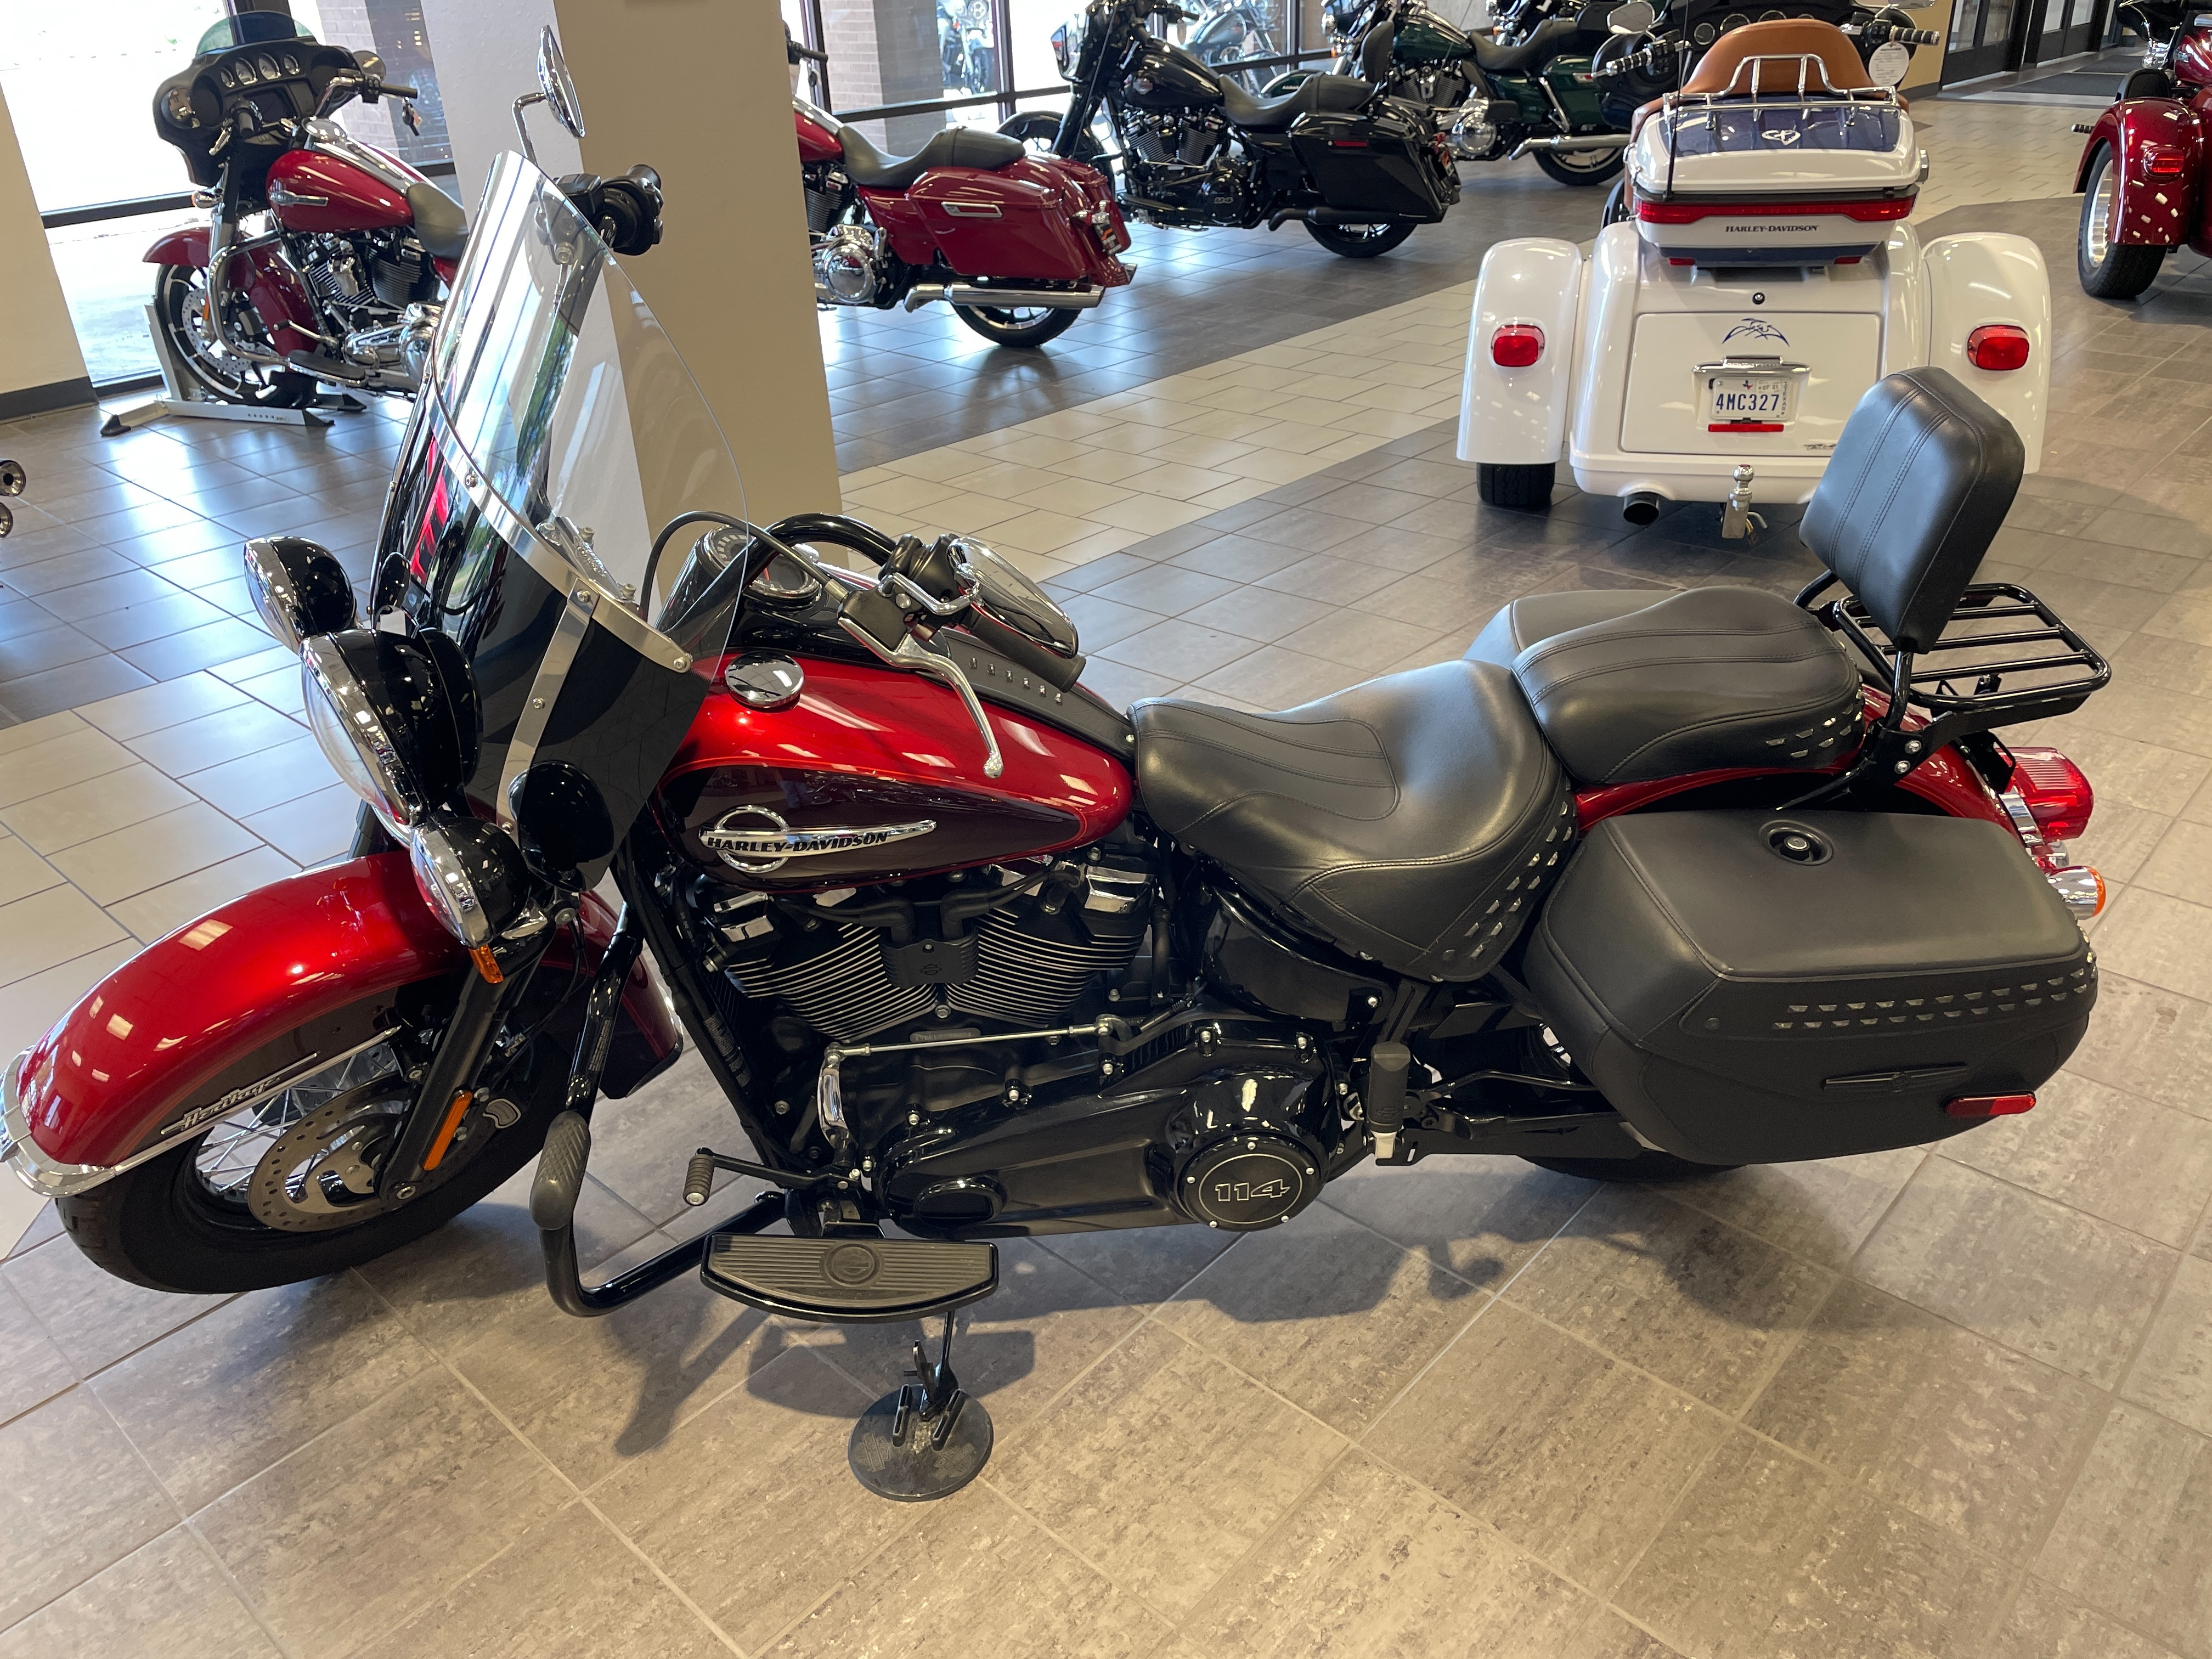 2019 Harley-Davidson Heritage Classic 114 Heritage Classic 114 at Tripp's Harley-Davidson